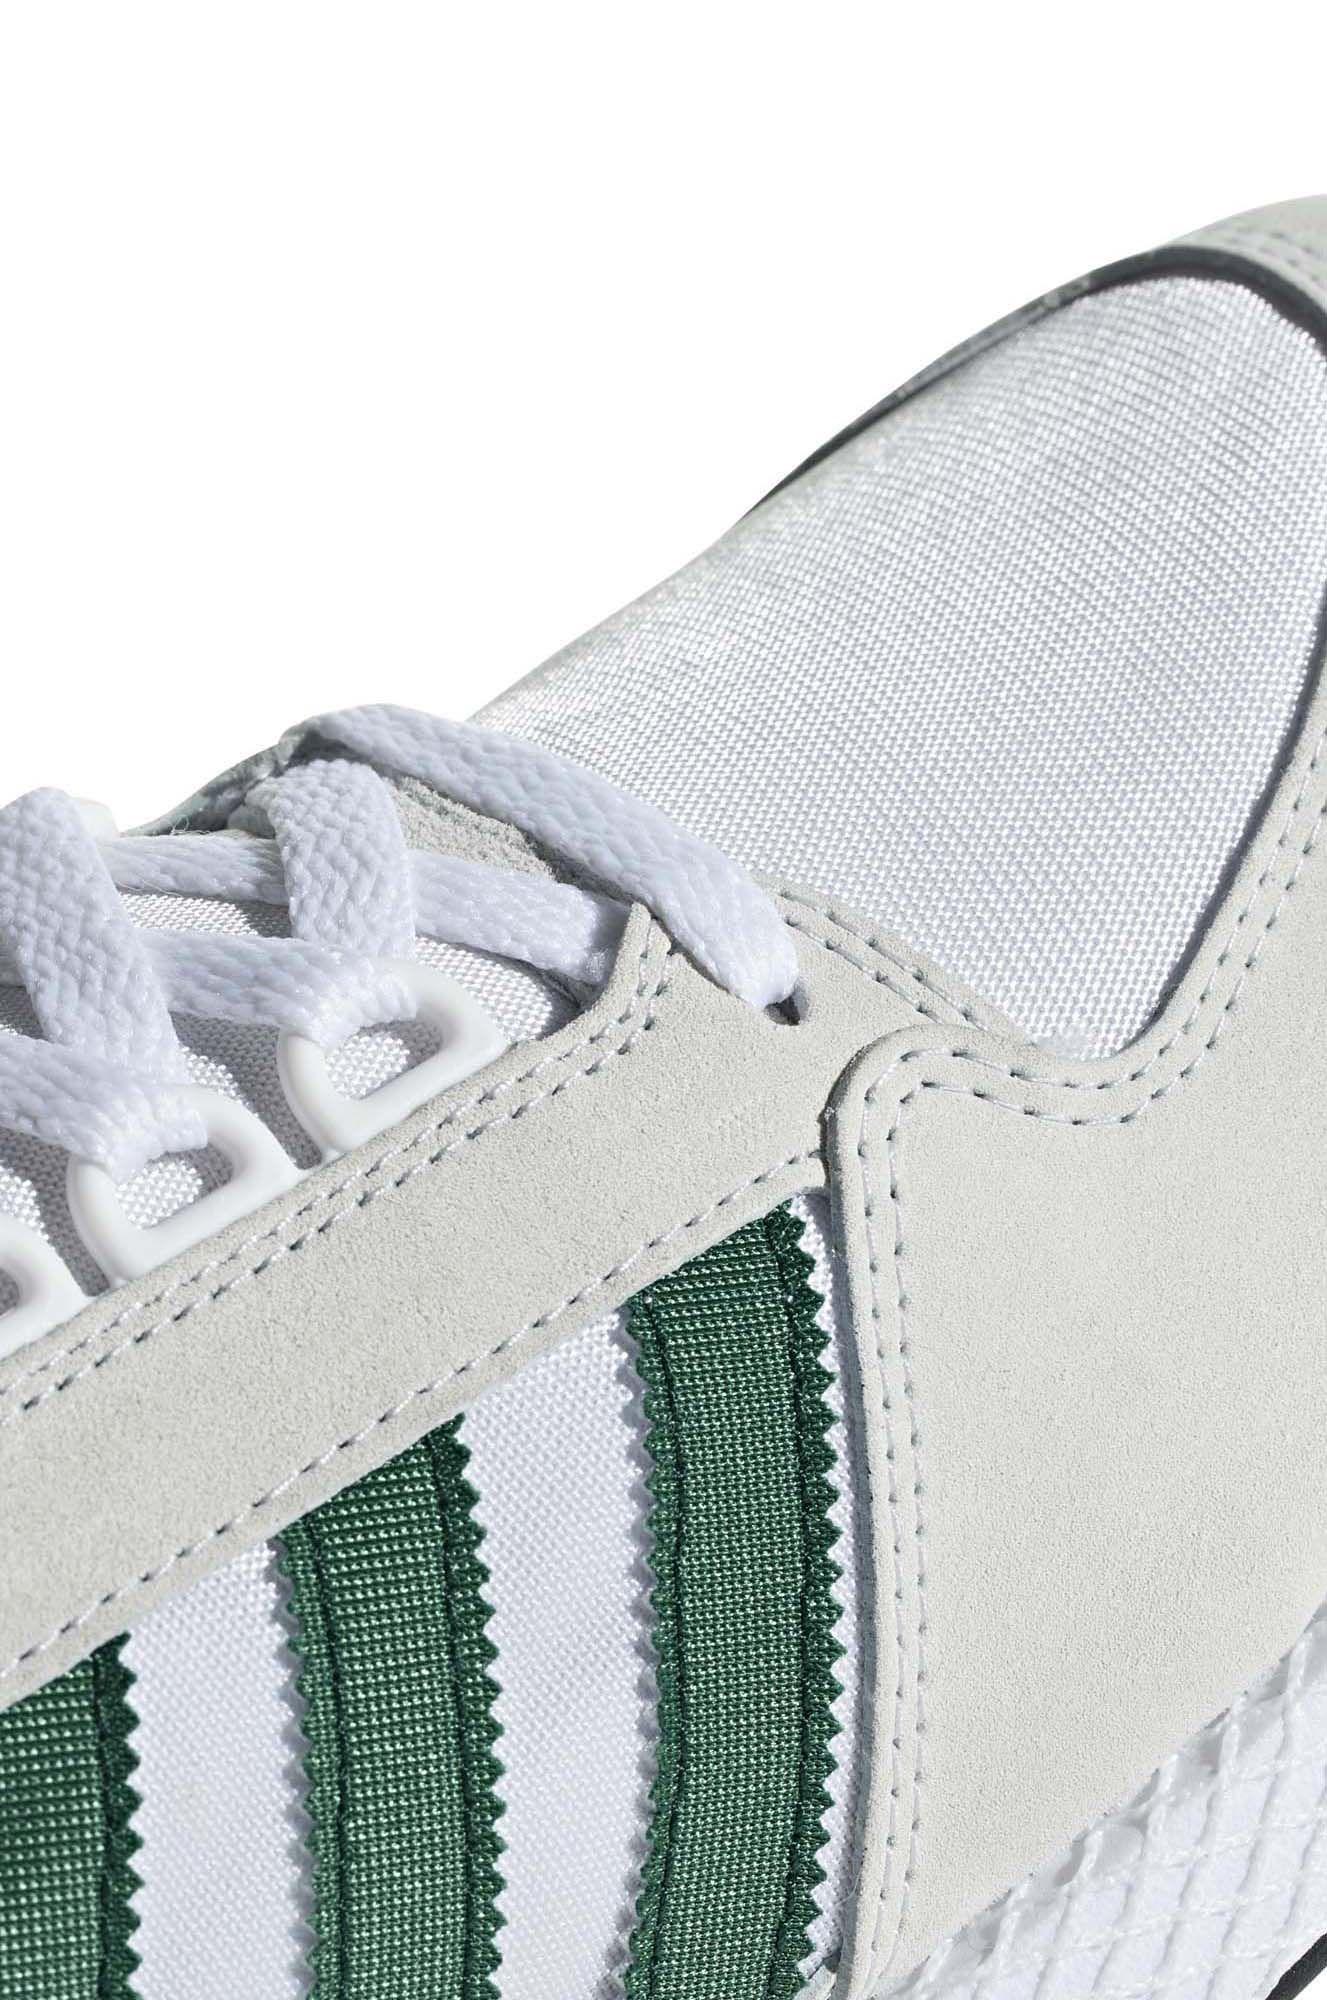 5c5efdf9302 Tenis Adidas FOREST GROVE Crystal White Collegiate Green Core Black ...